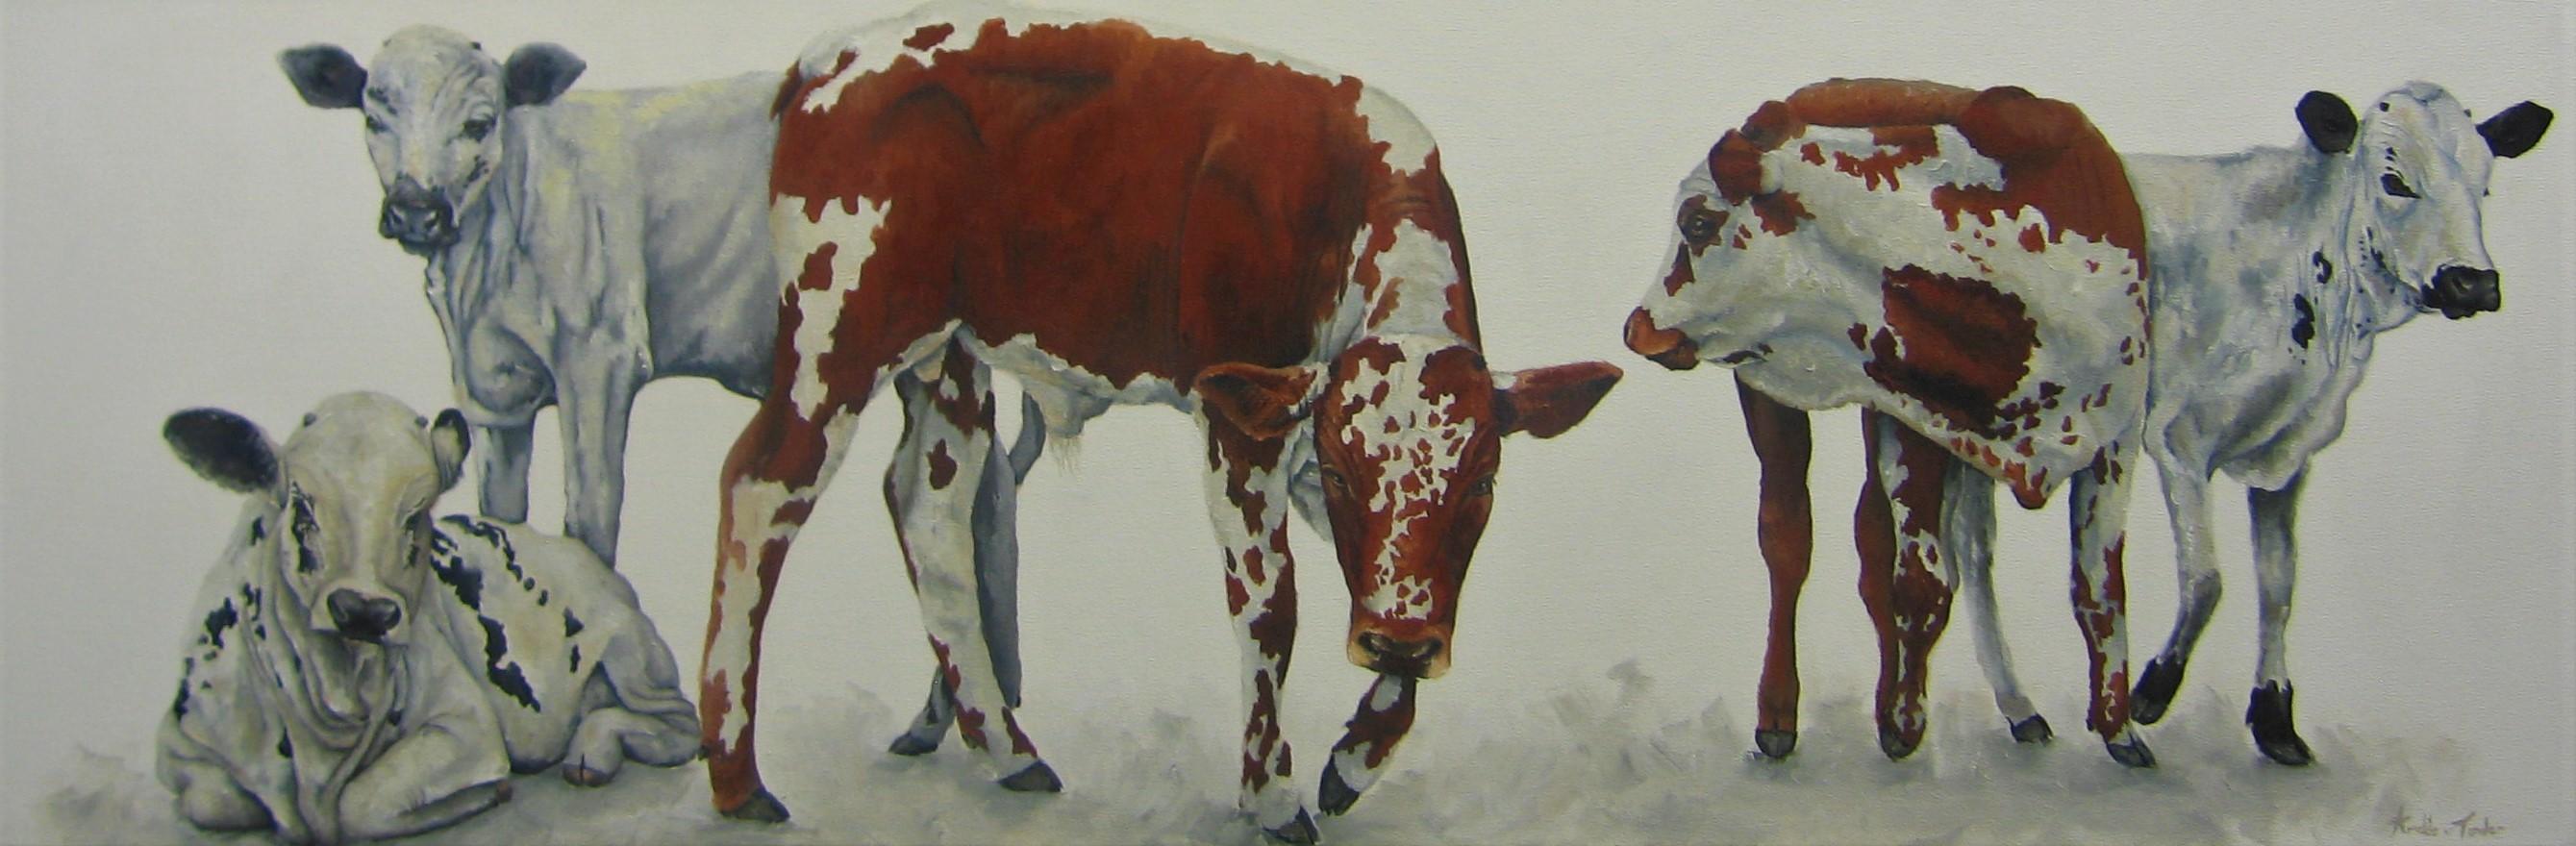 22222 50 x 150 crouse art gallery for Miroir 50 x 150